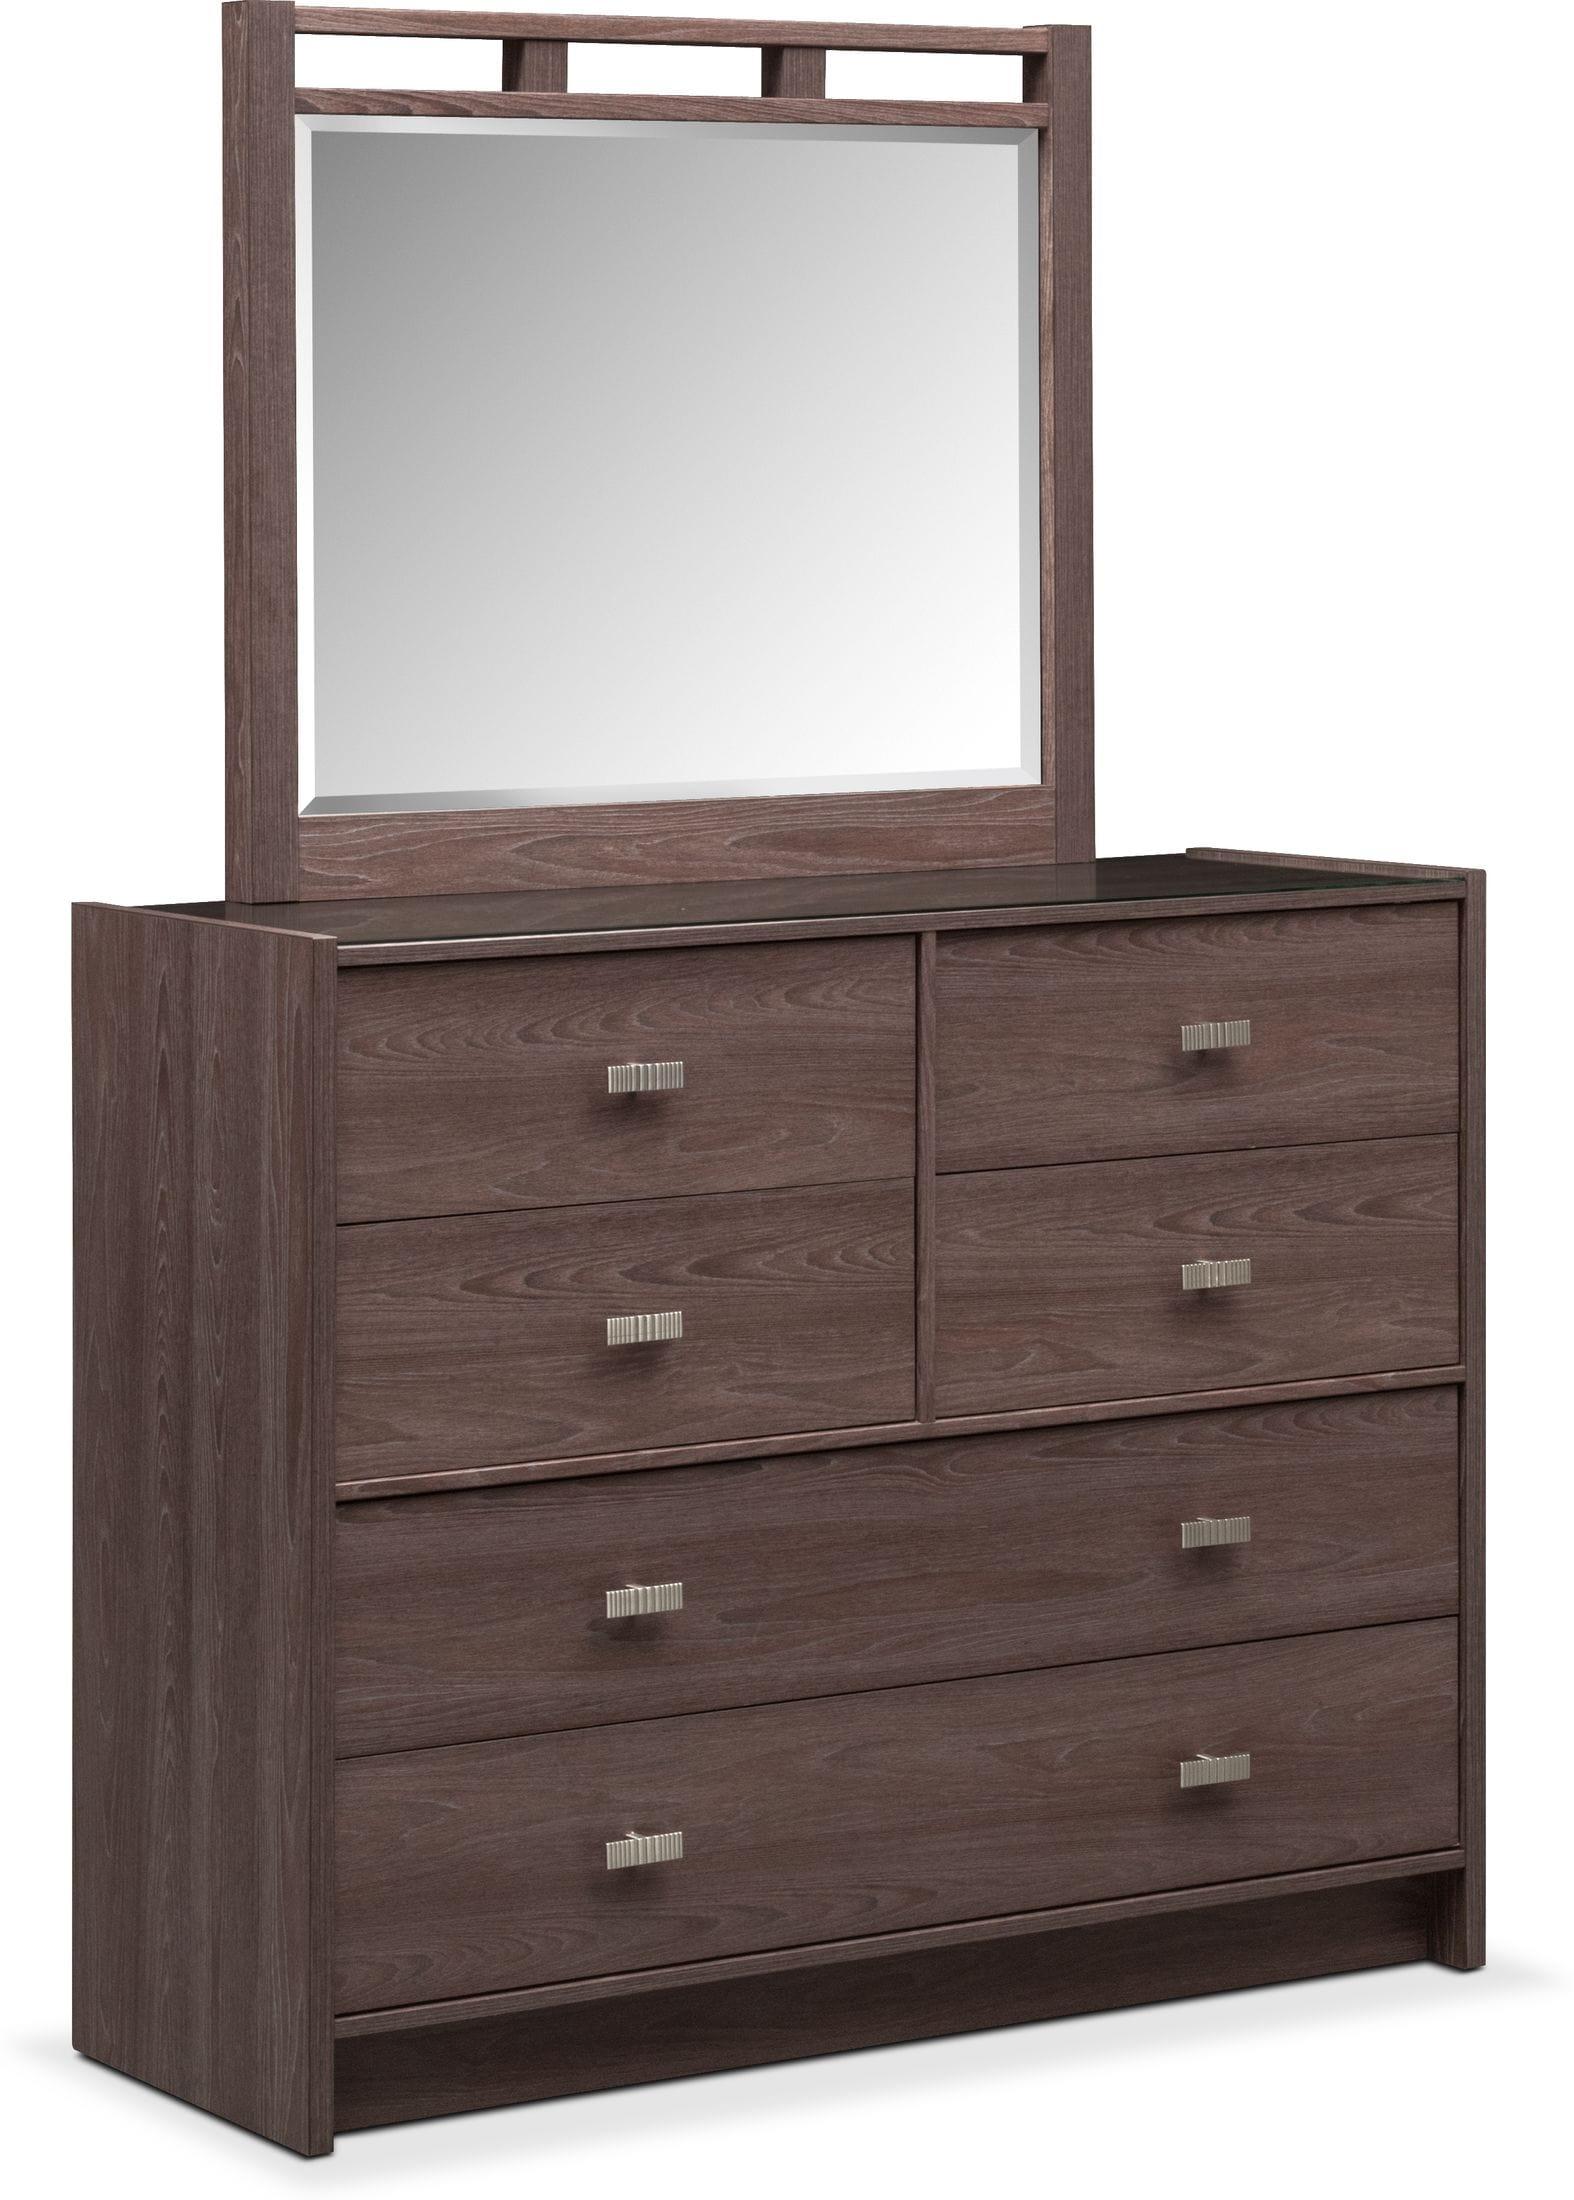 Bedroom Furniture - Britto Dresser and Mirror